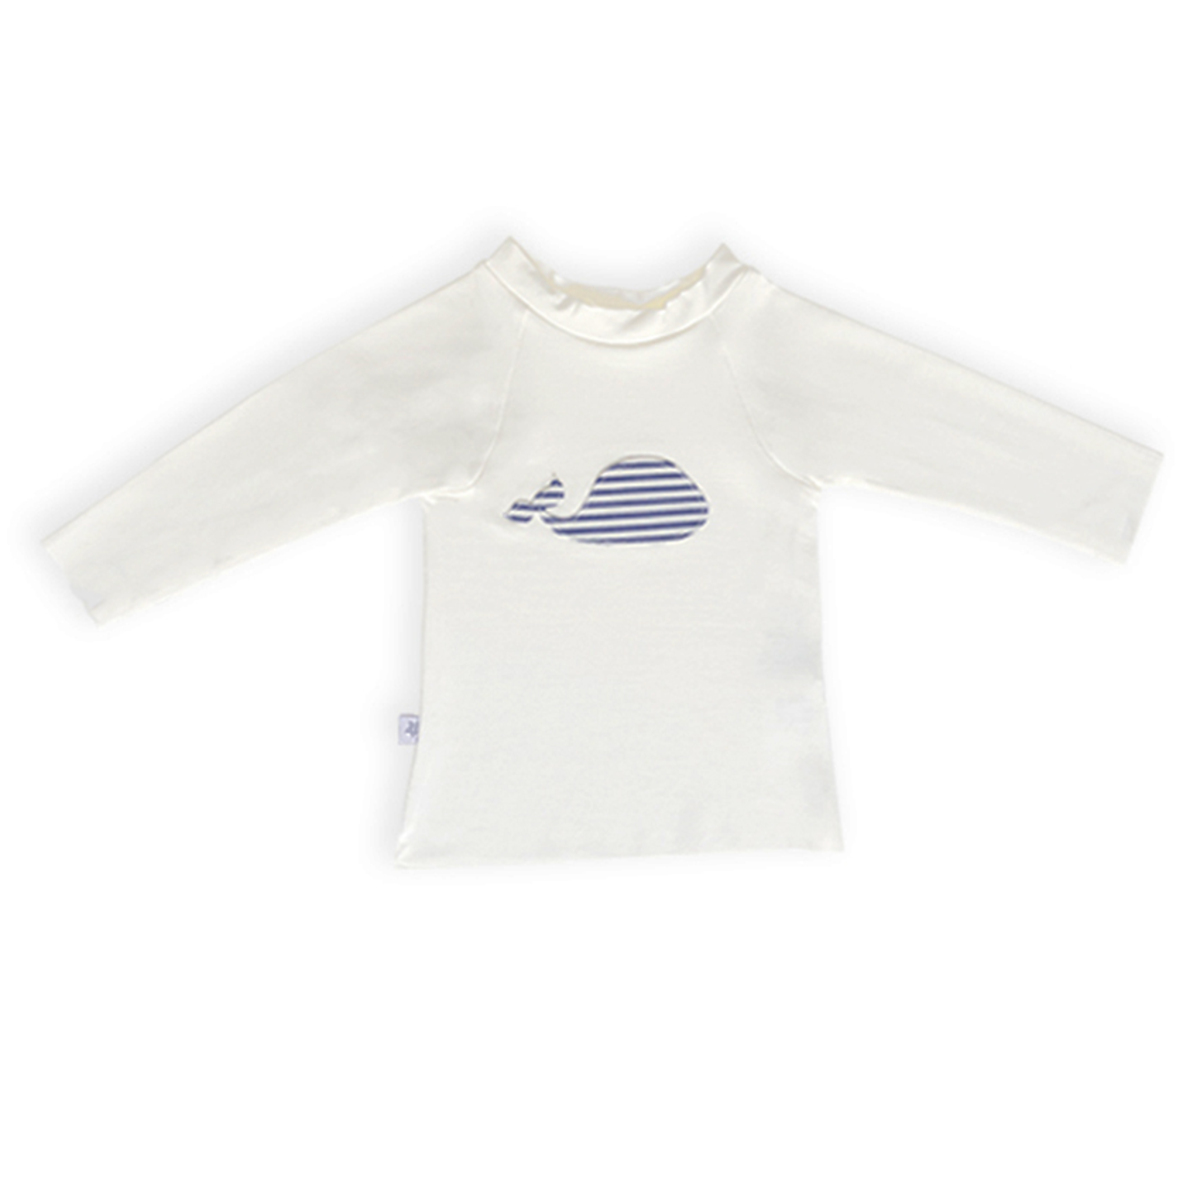 Accessoires bébé Tee-Shirt Anti-UV Marin Mousse - 36 Mois Tee-Shirt Anti-UV Marin Mousse - 36 Mois